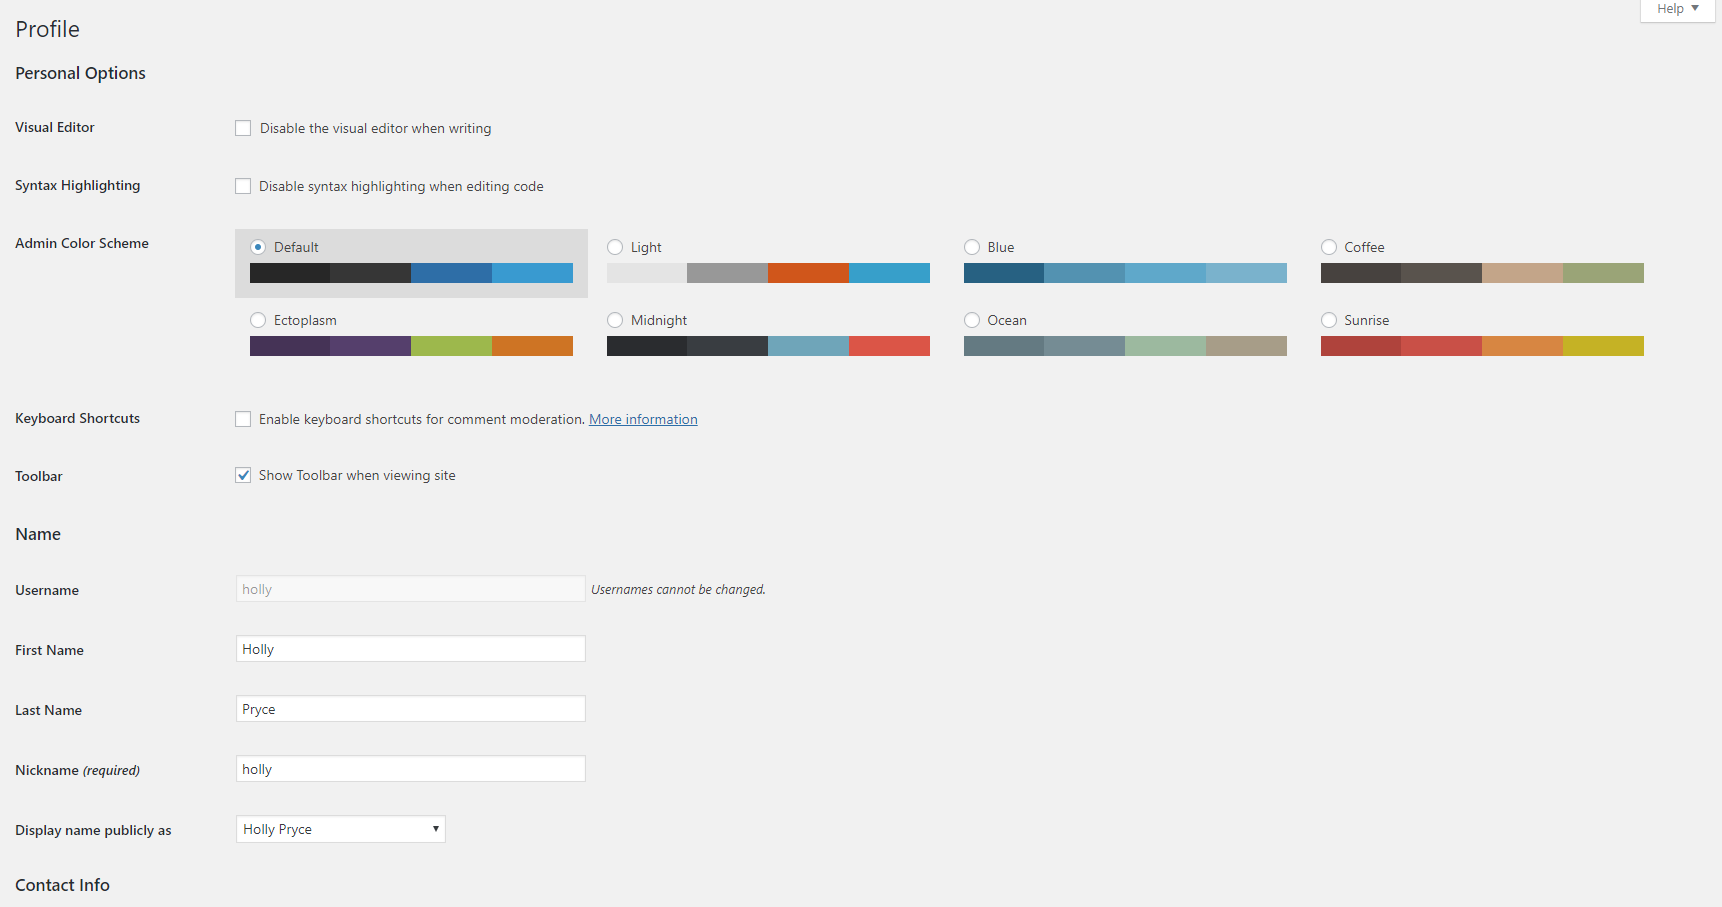 User profile in WordPress | HollyPryce.com